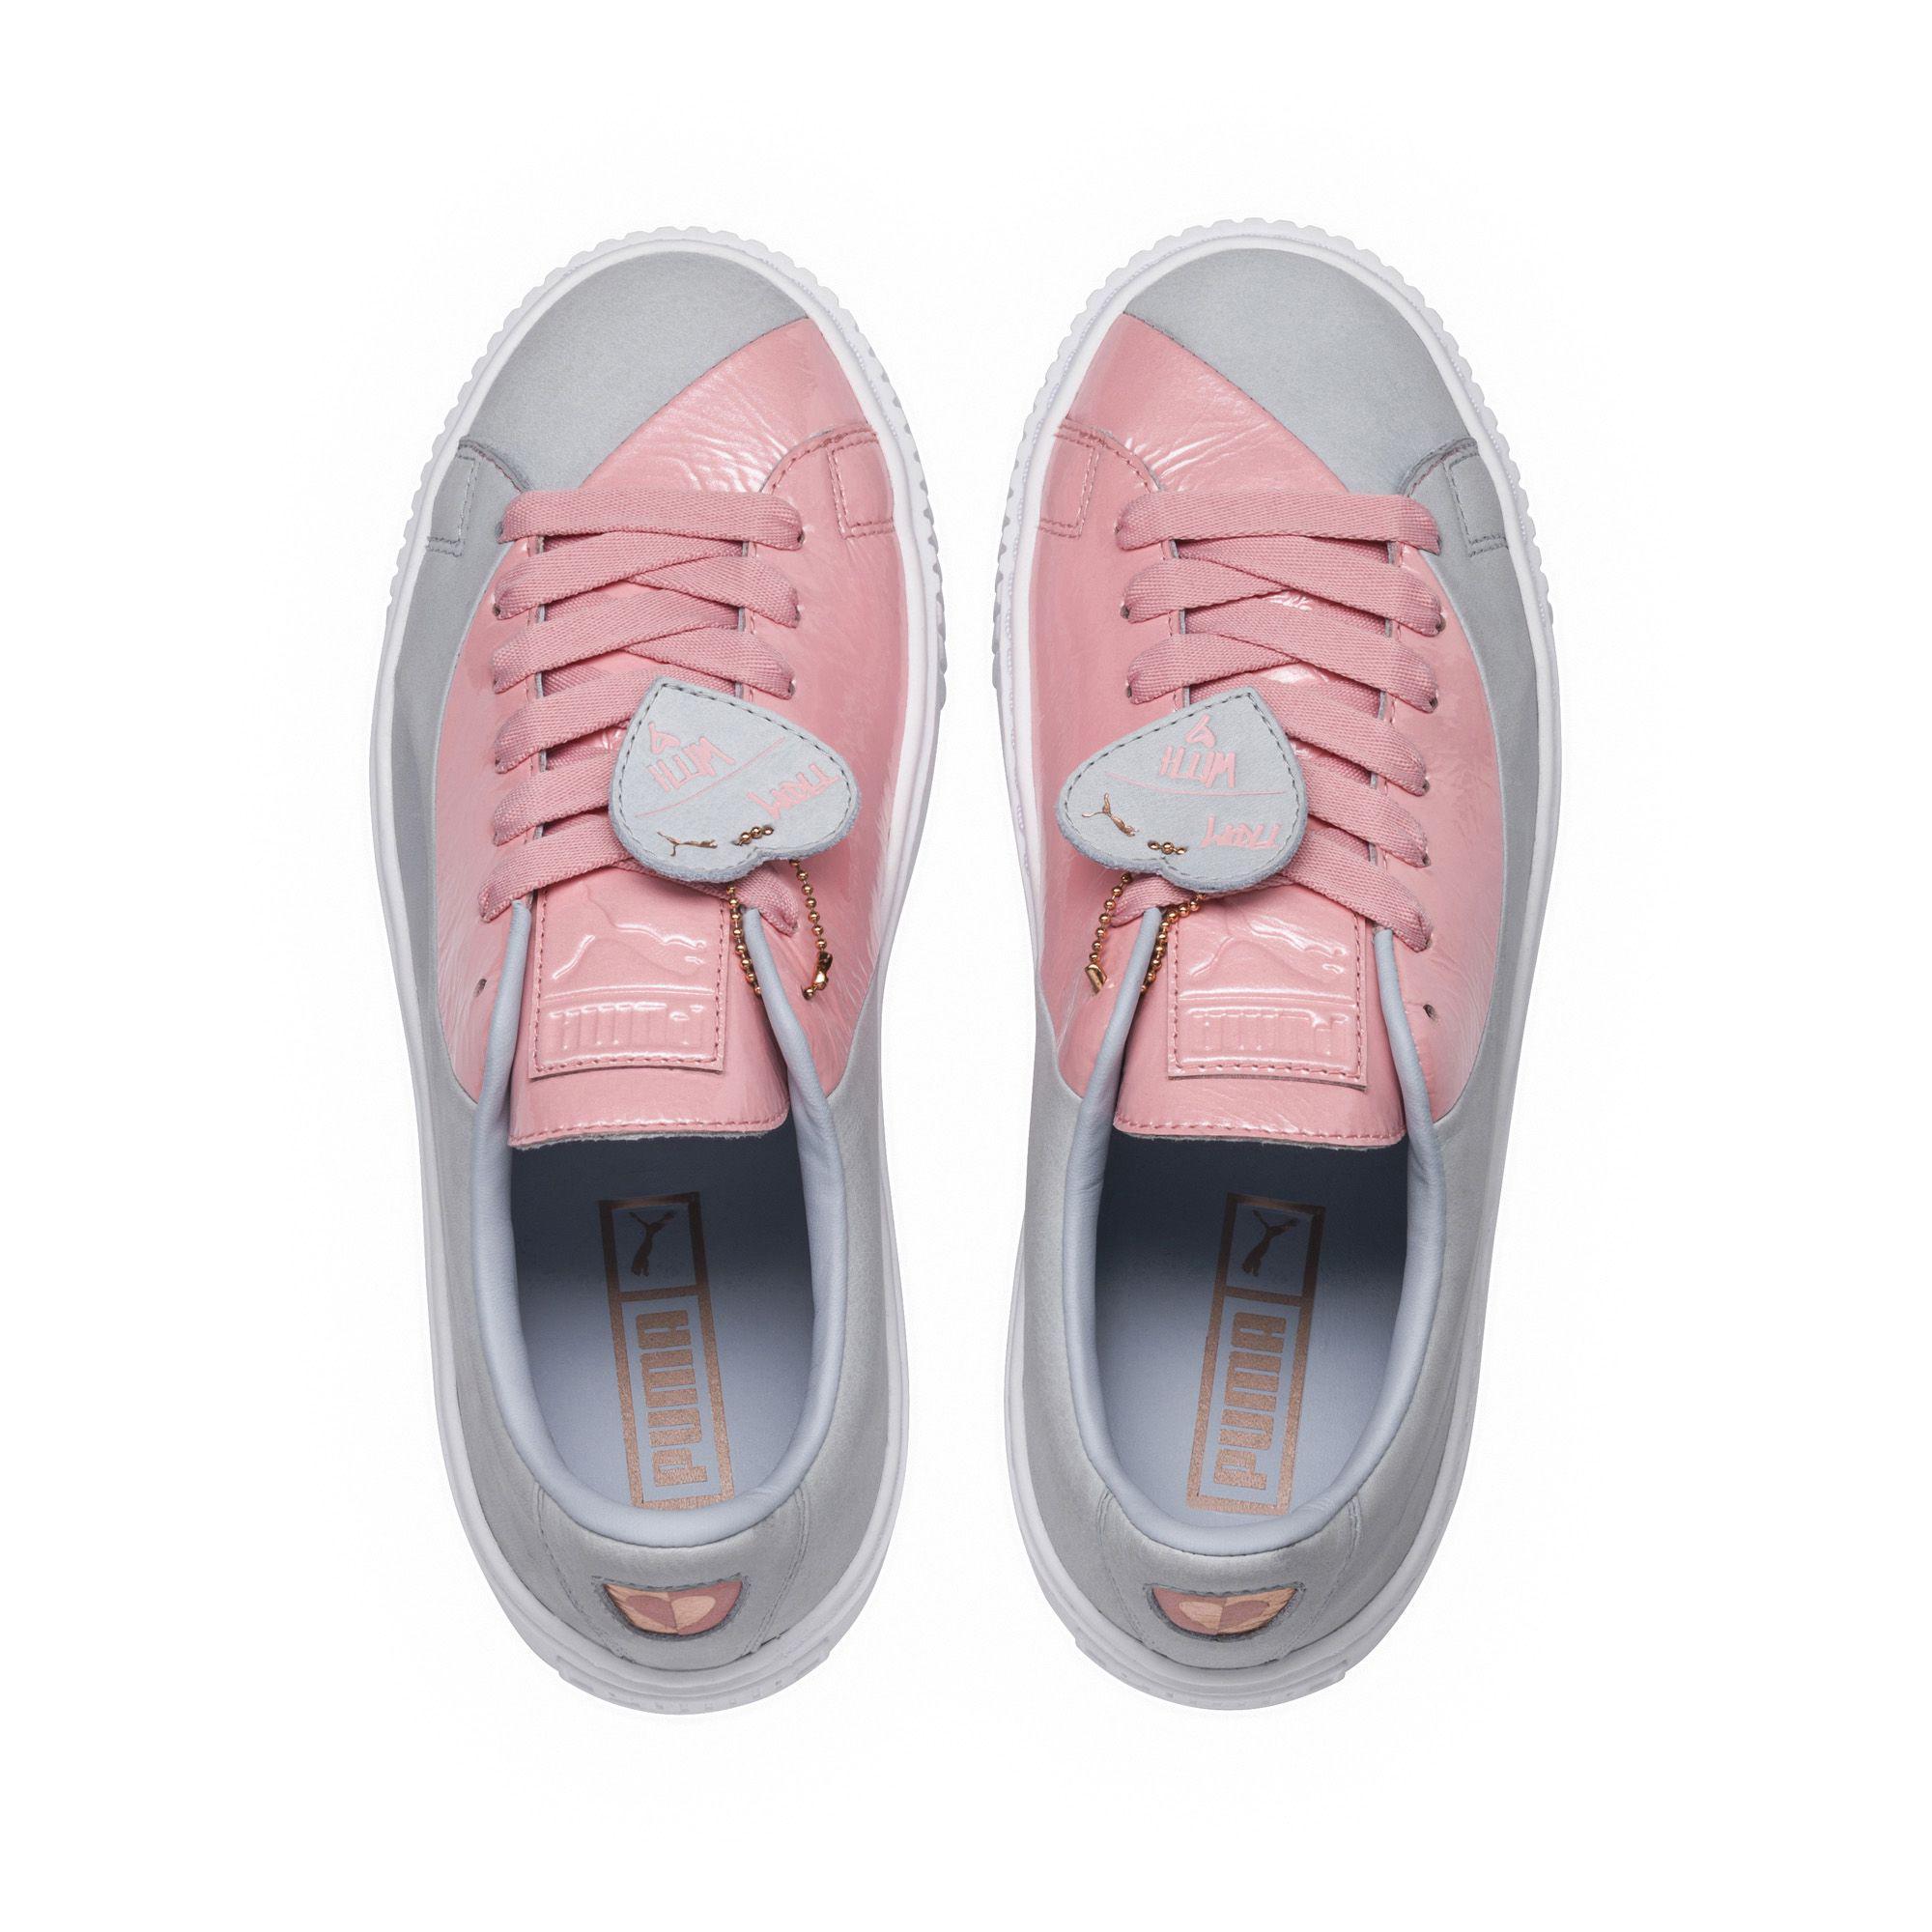 100% authenticated professional website order Basket Platform Valentine Women's Sneakers